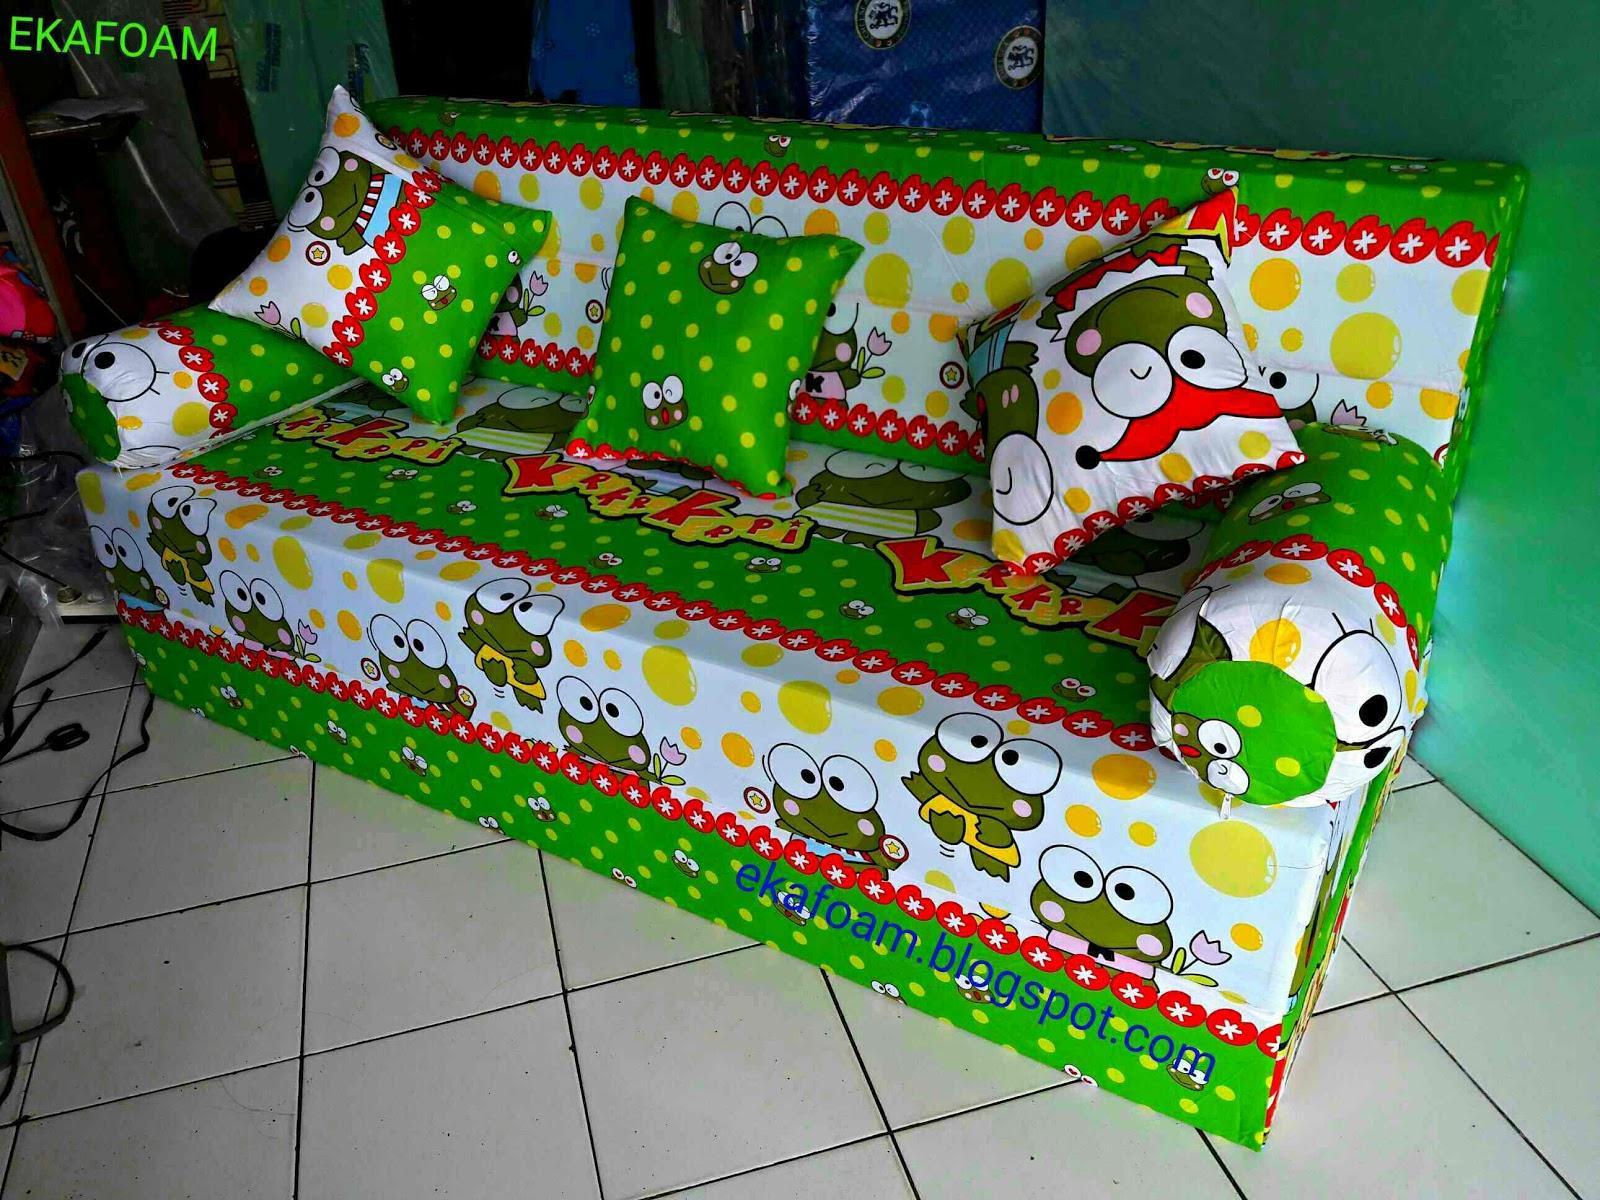 sofa bed inoac 2017 full motif agen resmi kasur busa